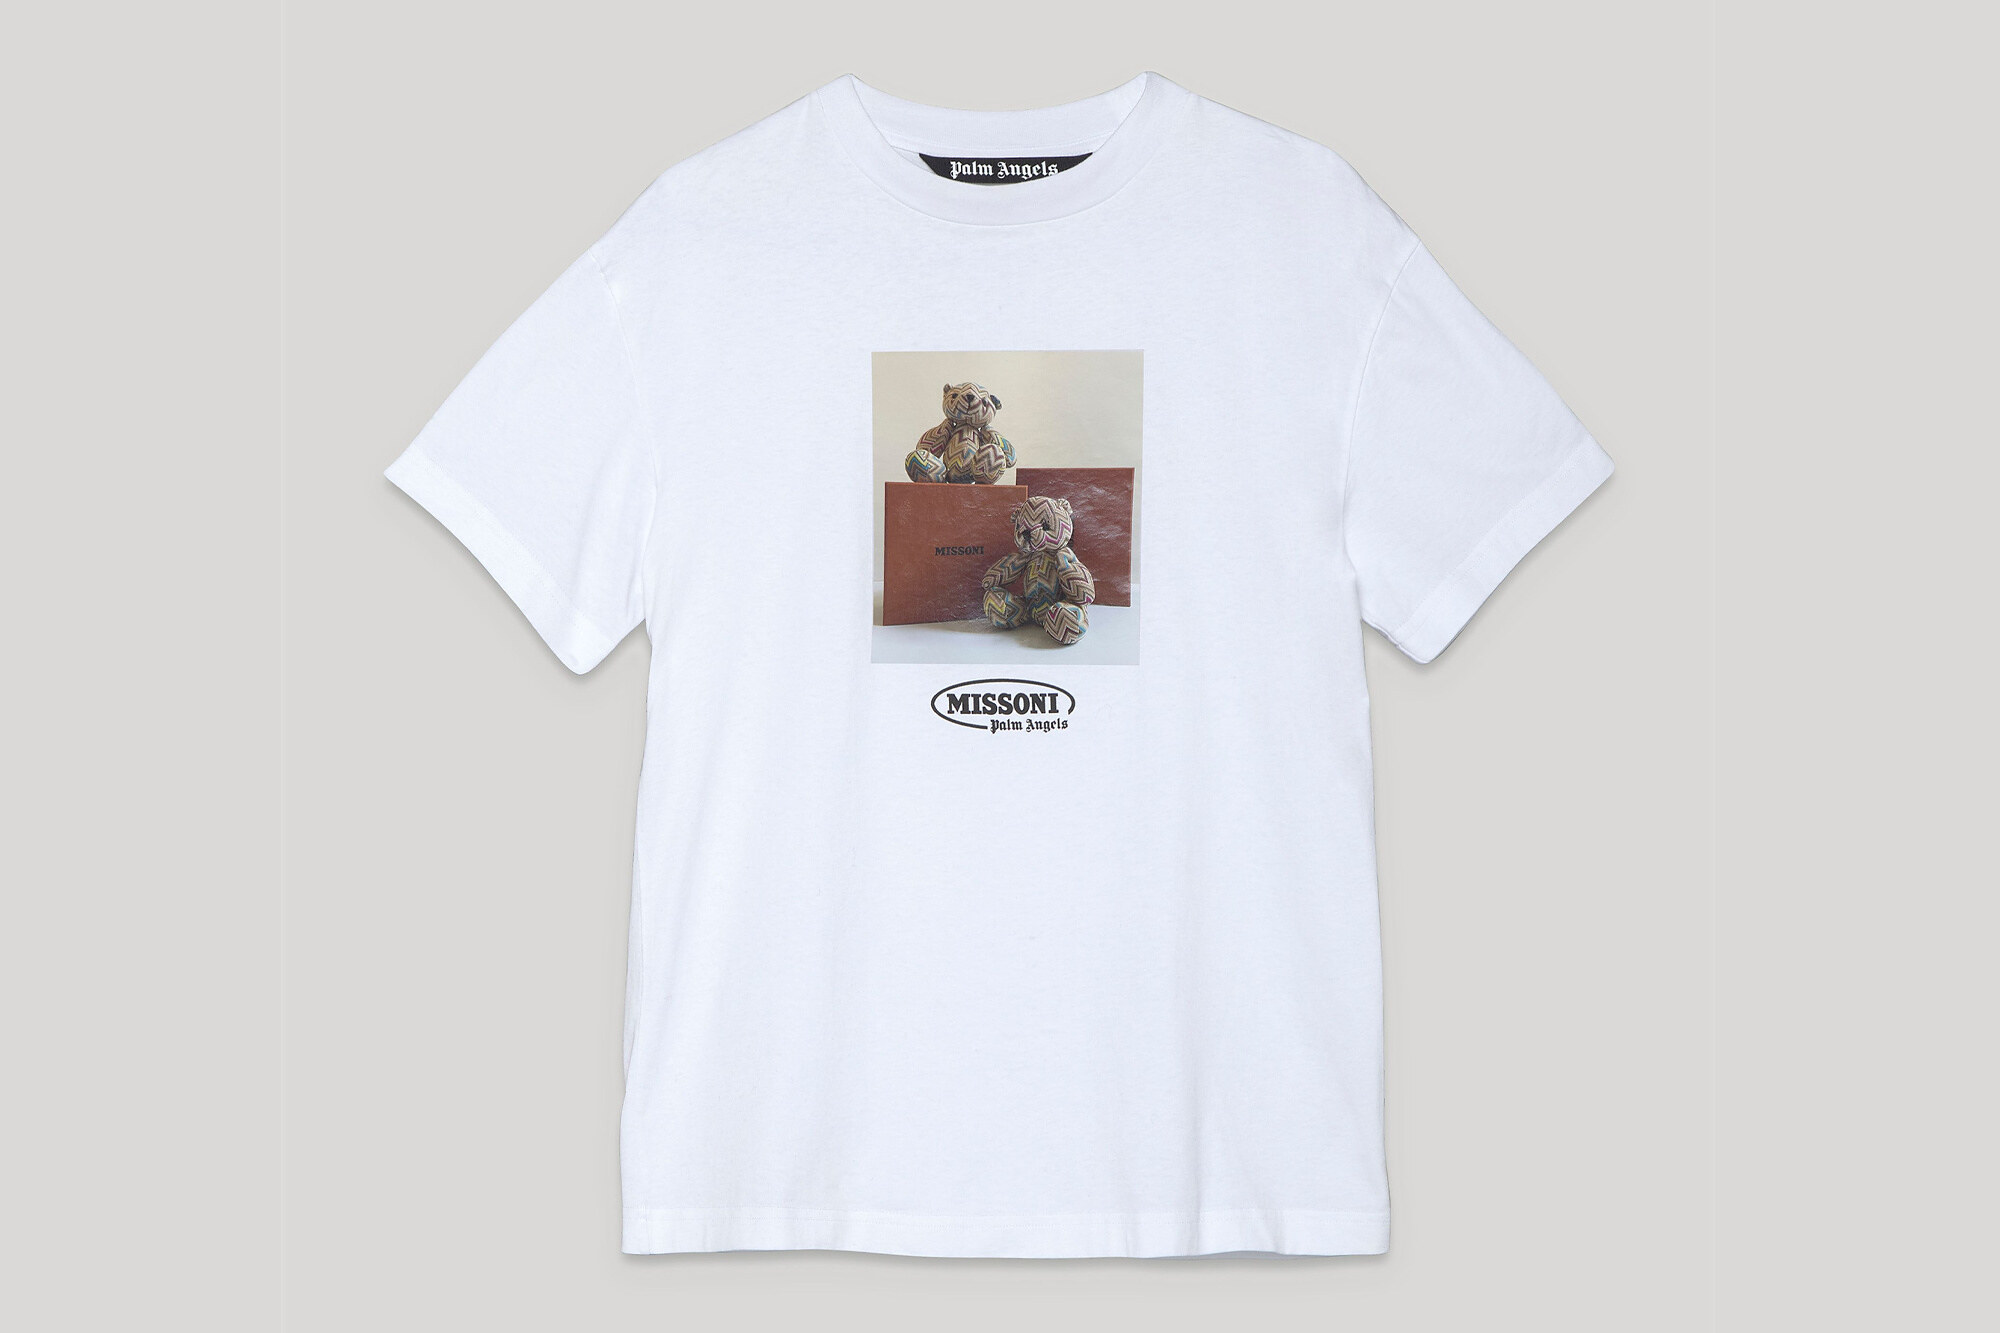 Palm Angels x Missoni t-shirt